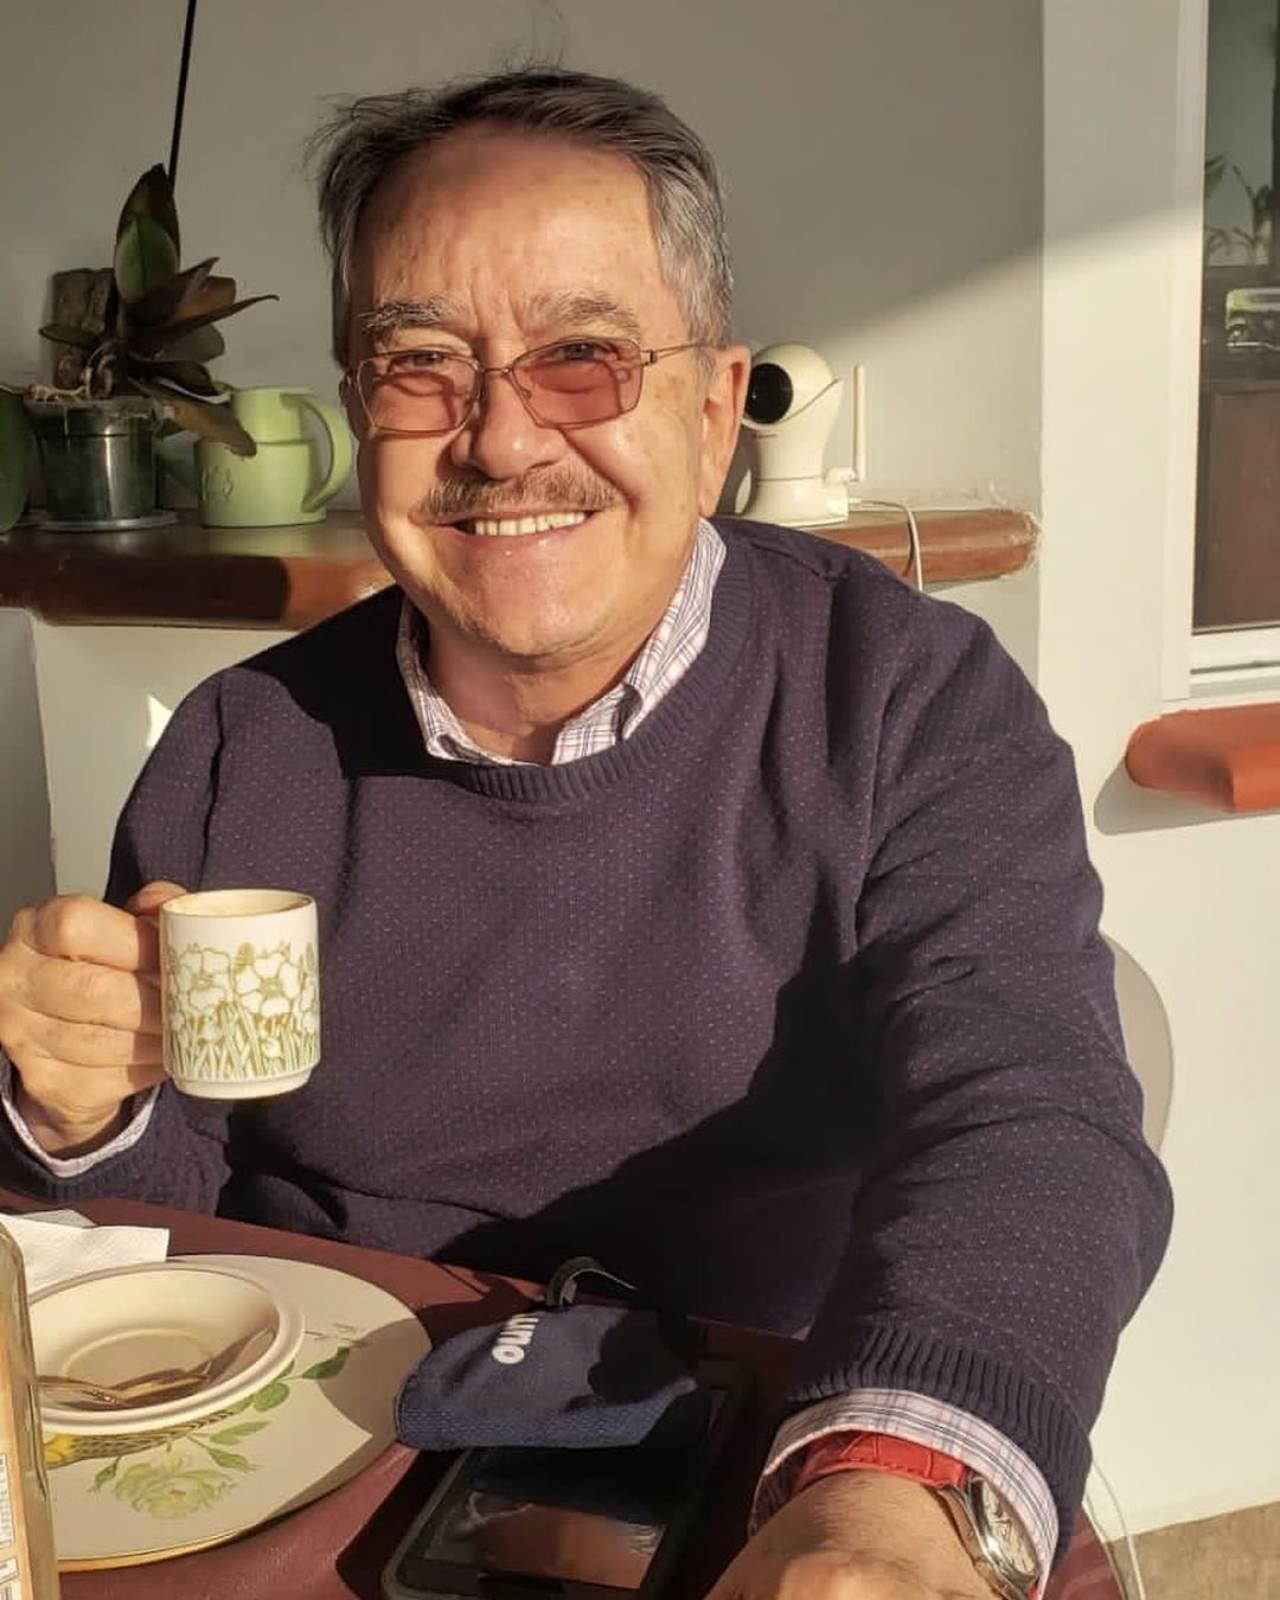 Pedrito Sola tomando café